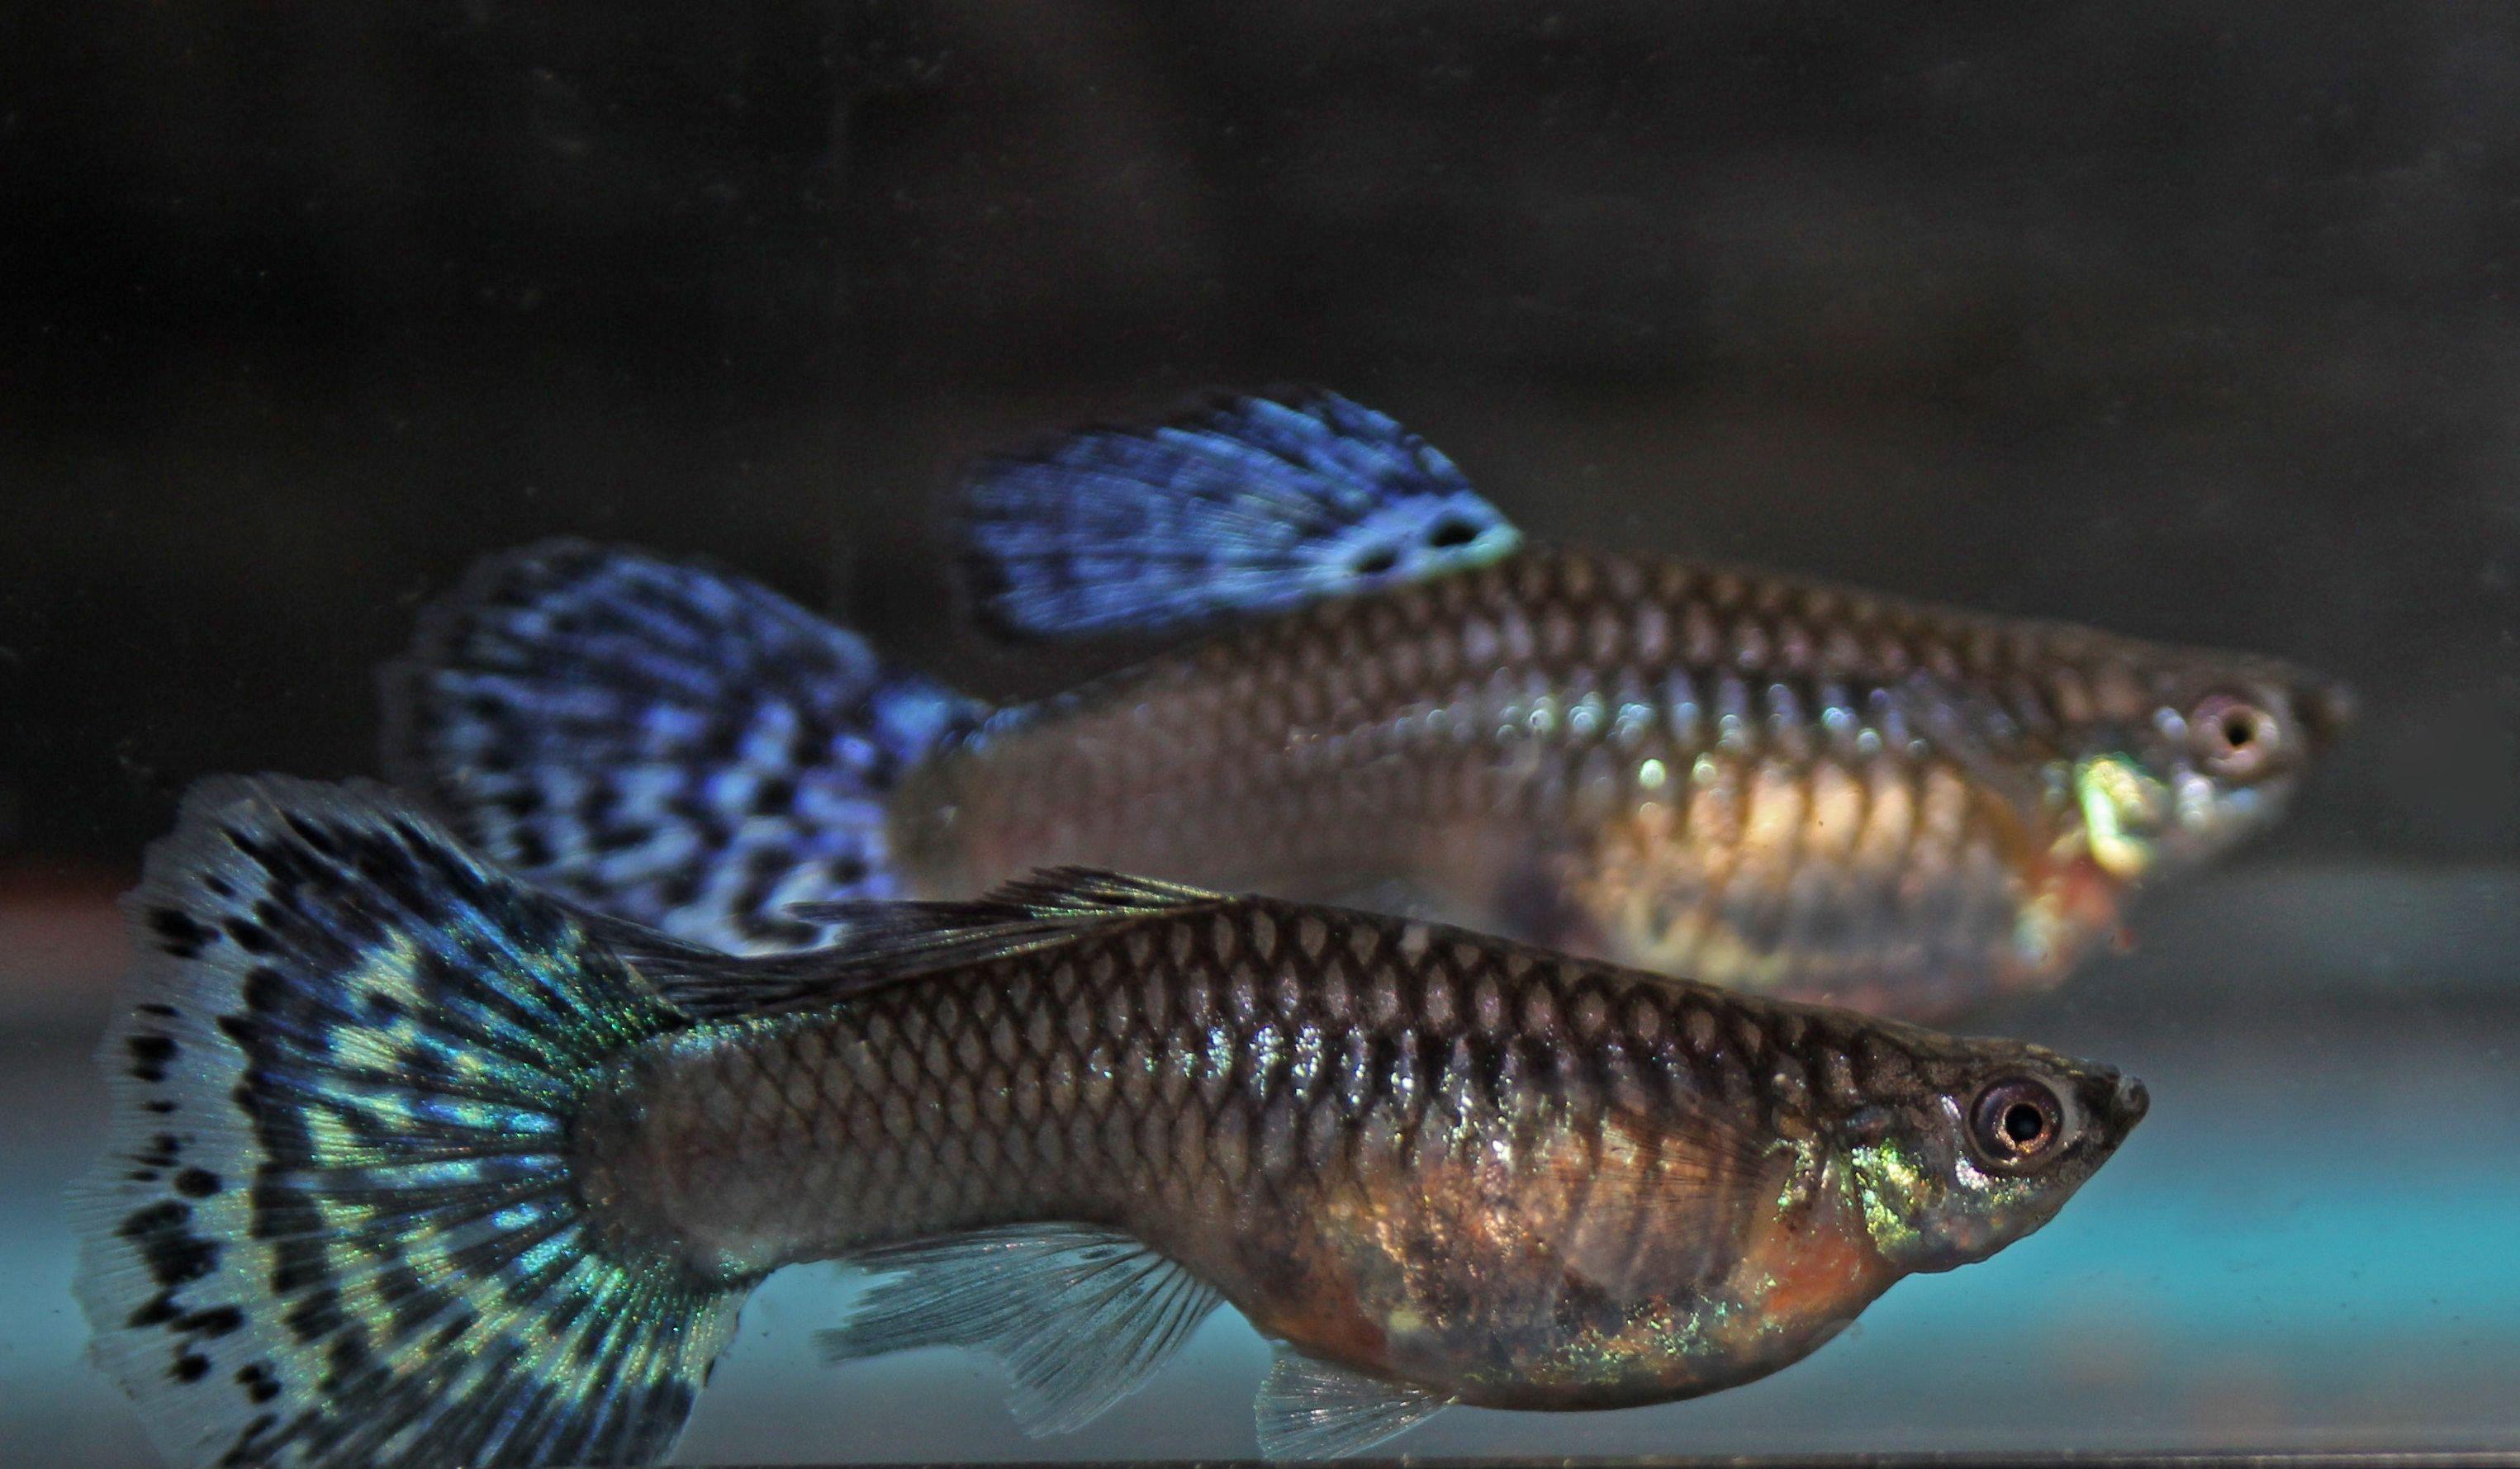 Some Colorful Female Guppies Guppy Fish Guppy Freshwater Aquarium Fish